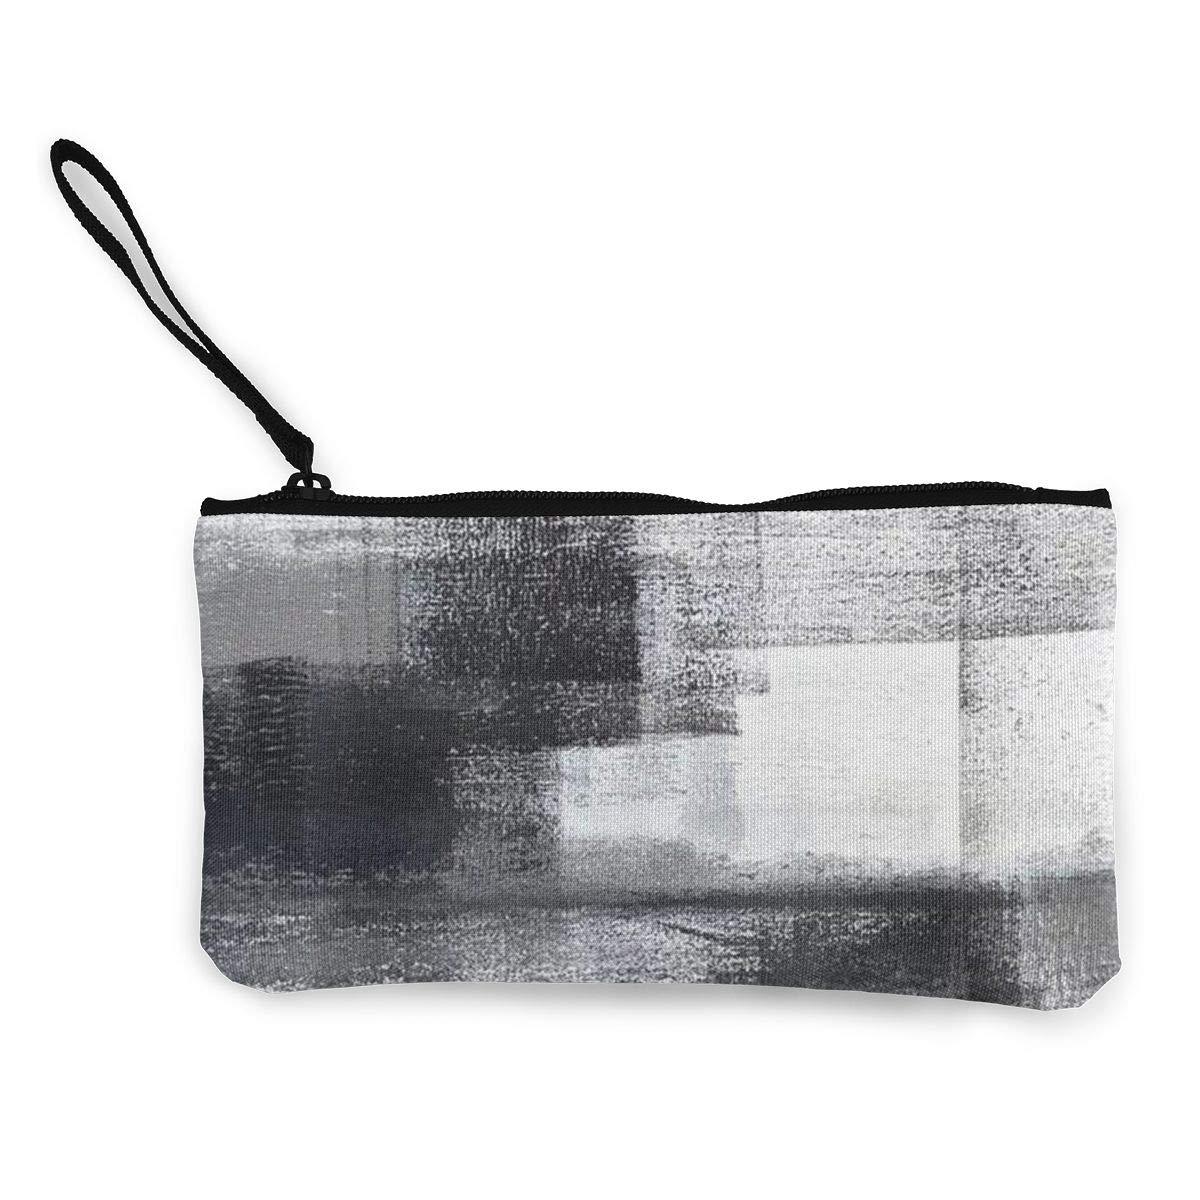 TR7FD15DE Mottled Zipper Canvas Coin Purse Wallet Cellphone Bag With Handle Make Up Bag